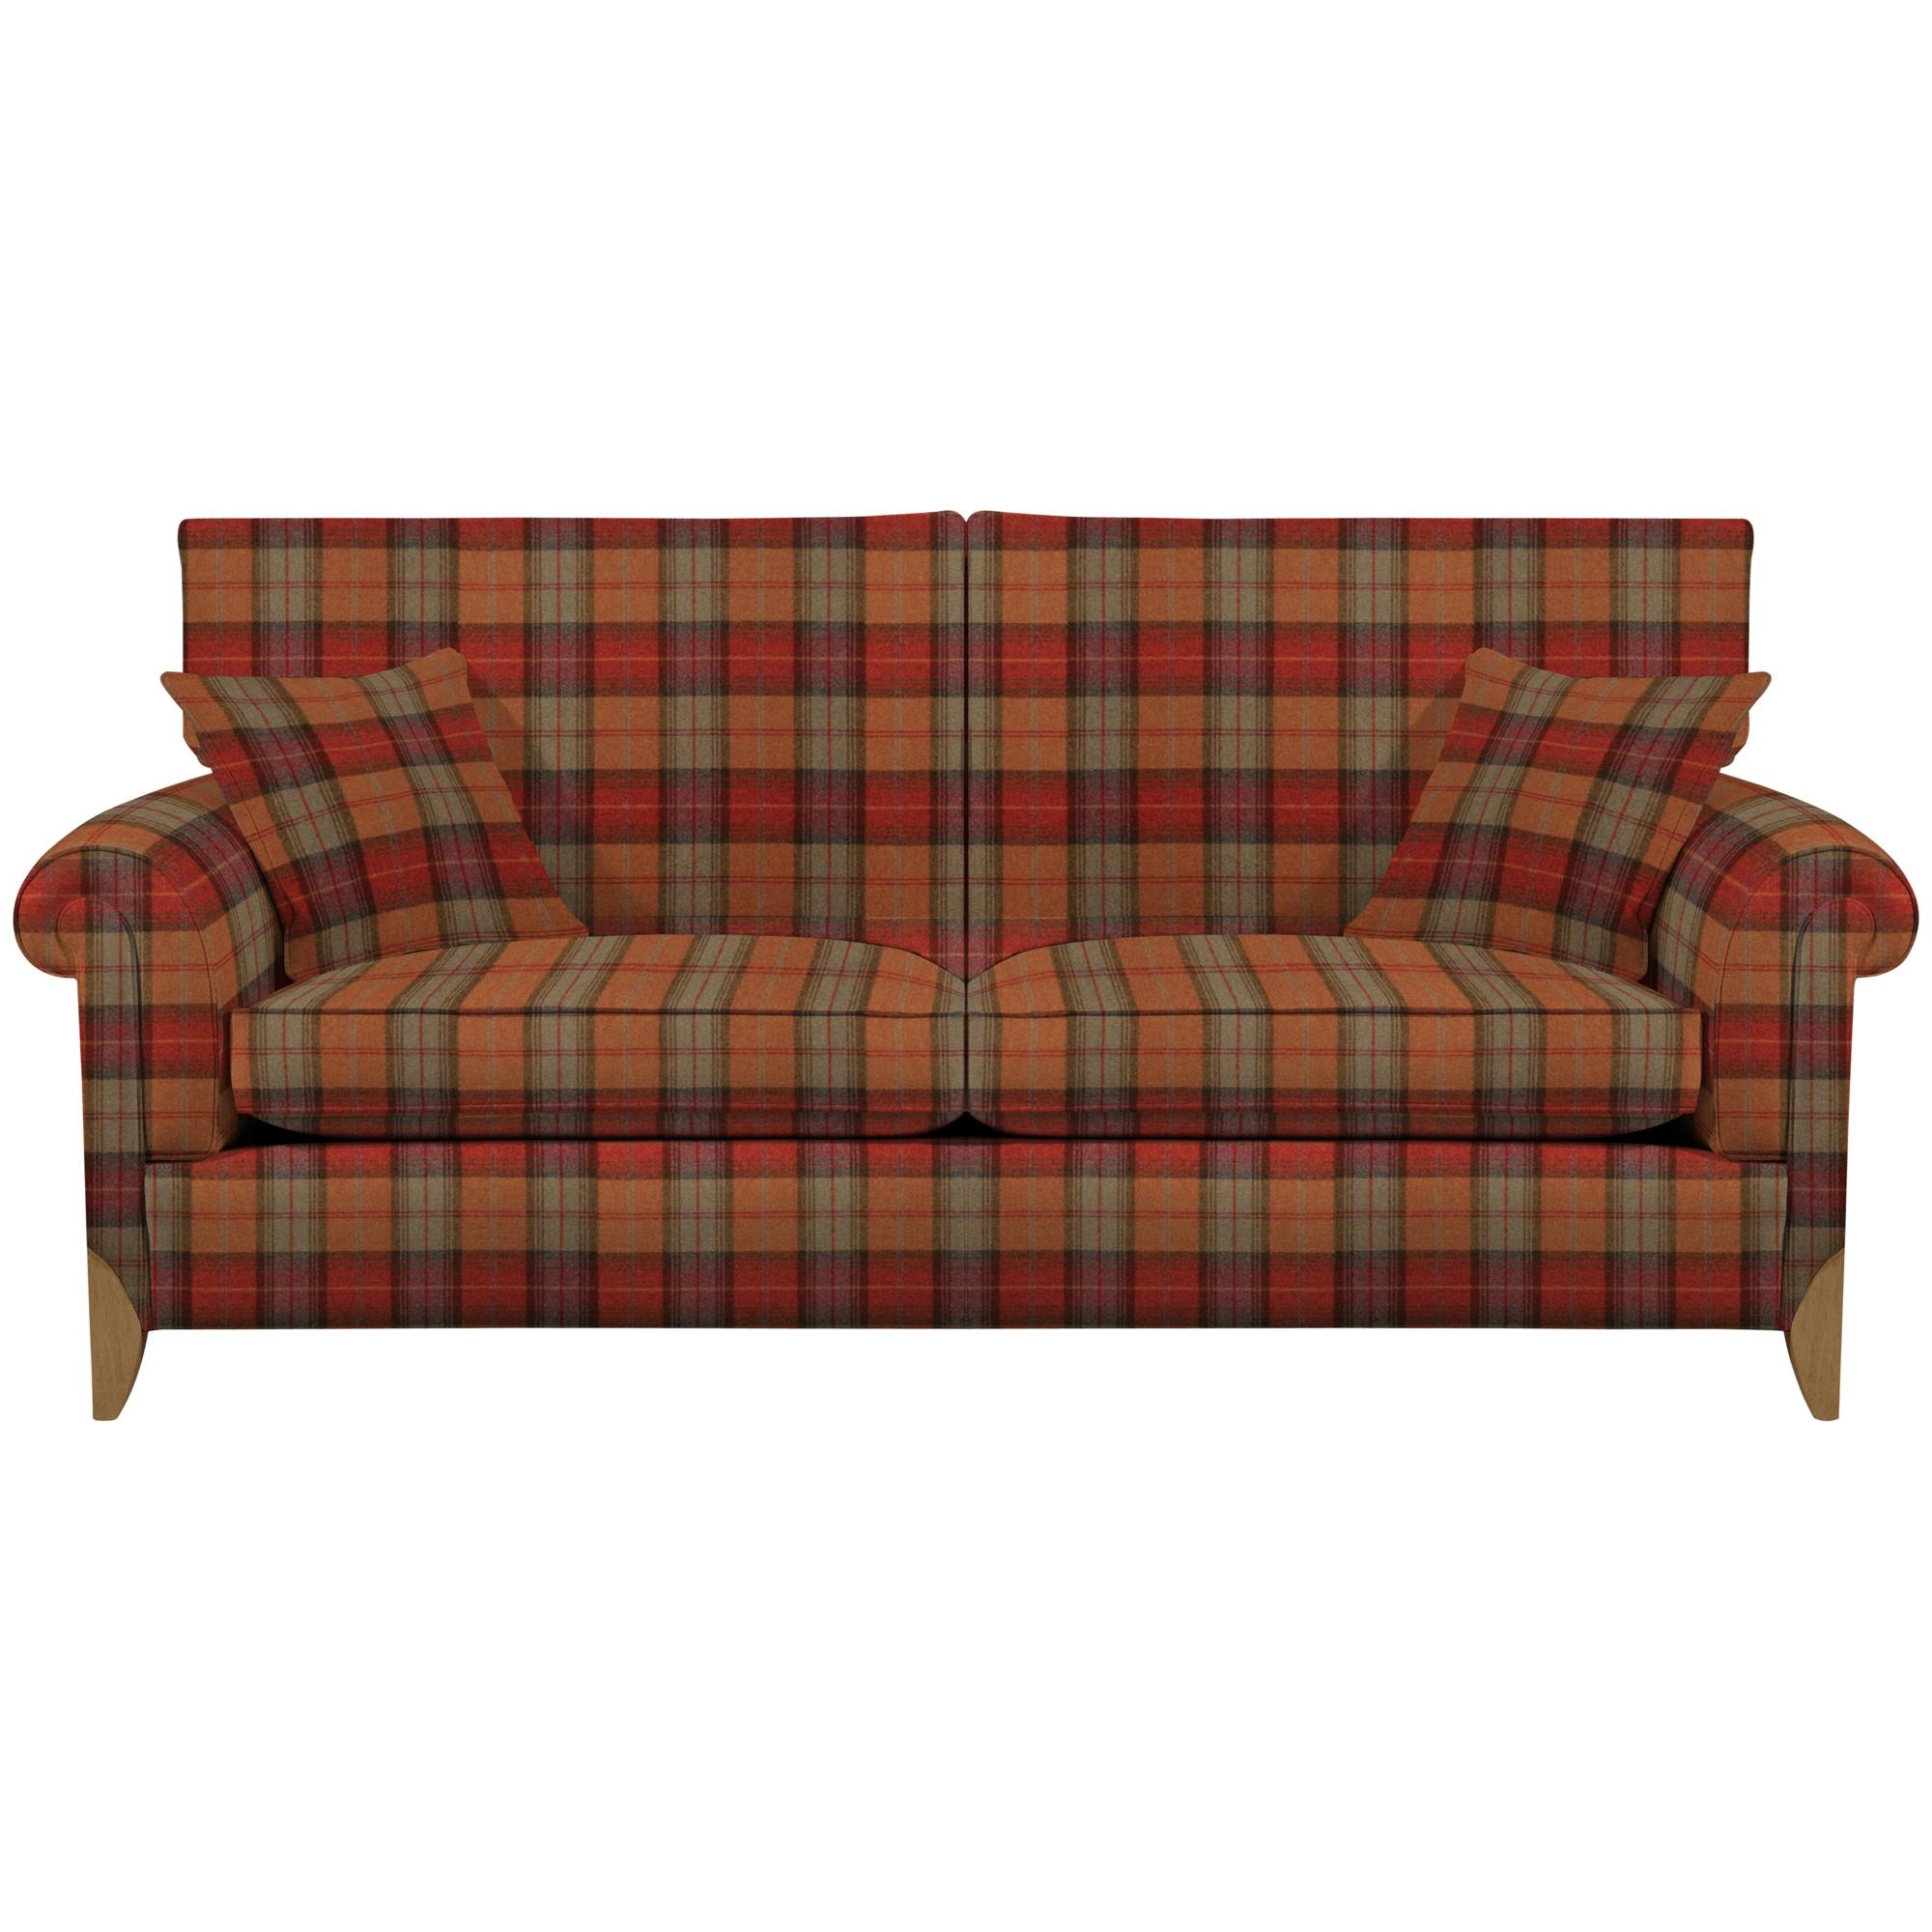 duresta cavendish large sofa 2 scatter cushions